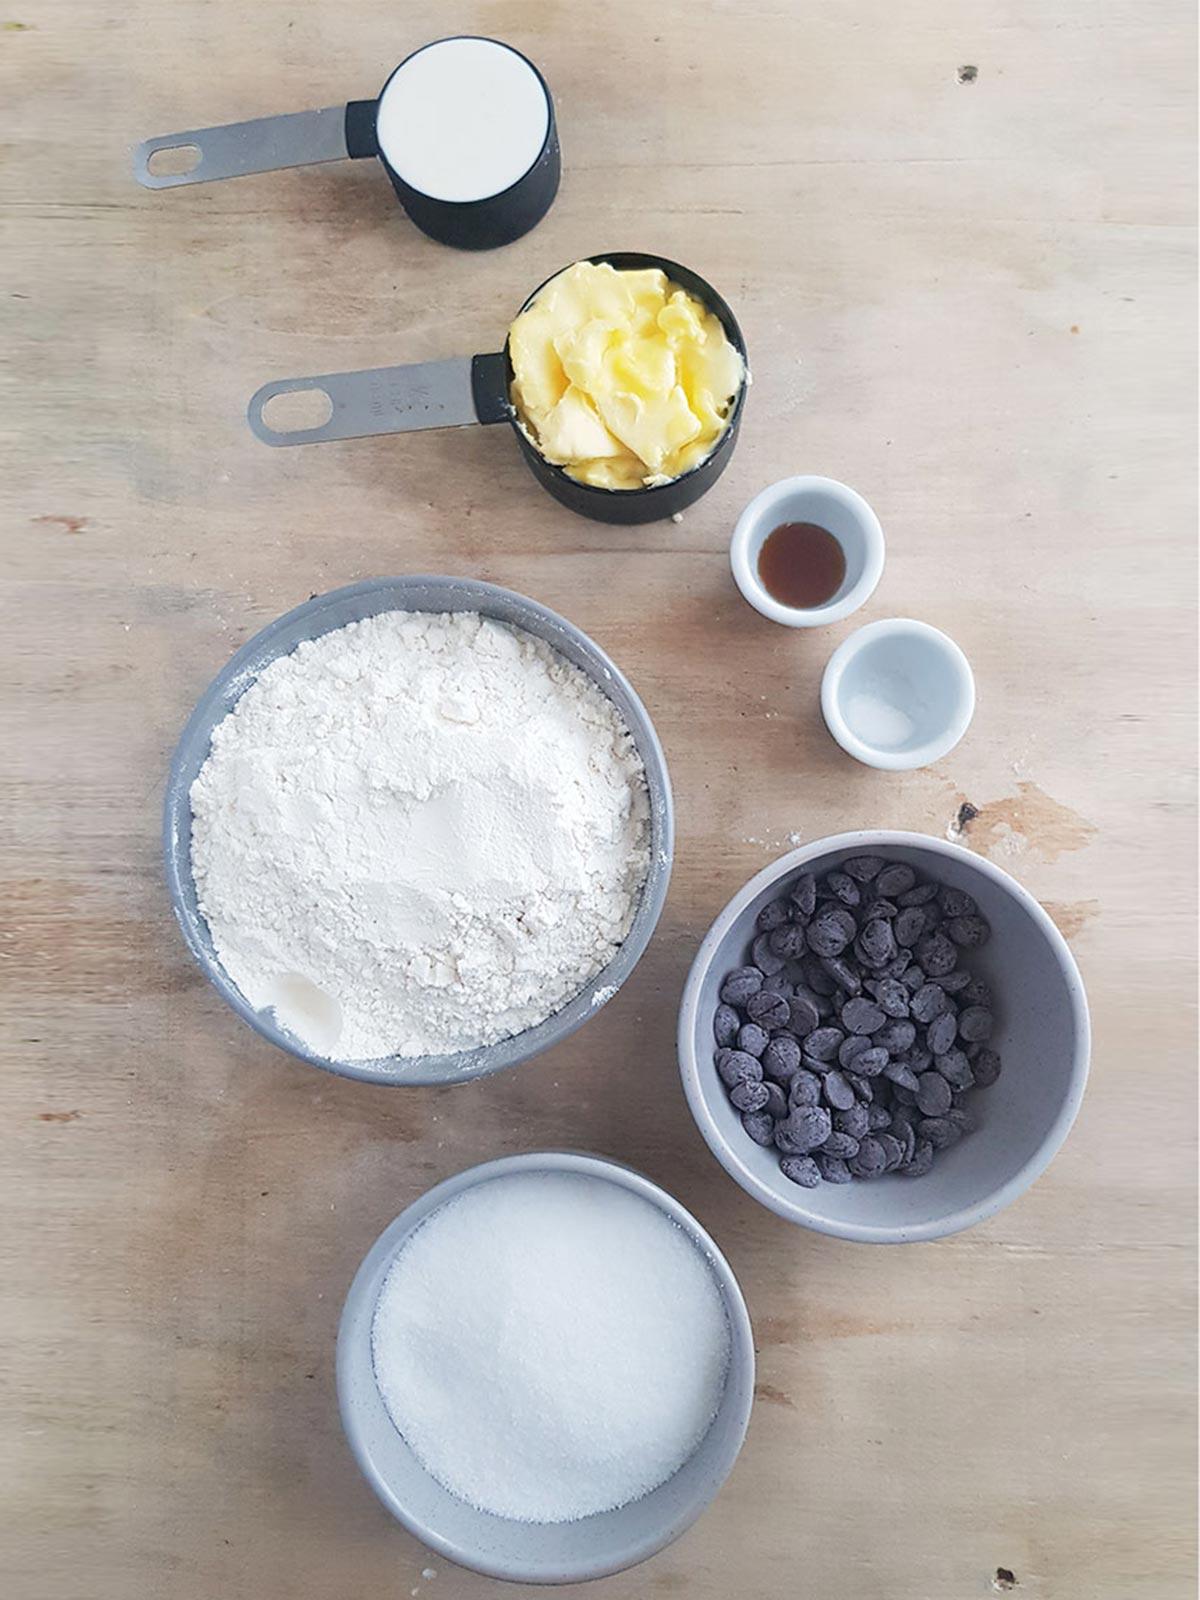 Eggless chocolate chip cookies ingredients